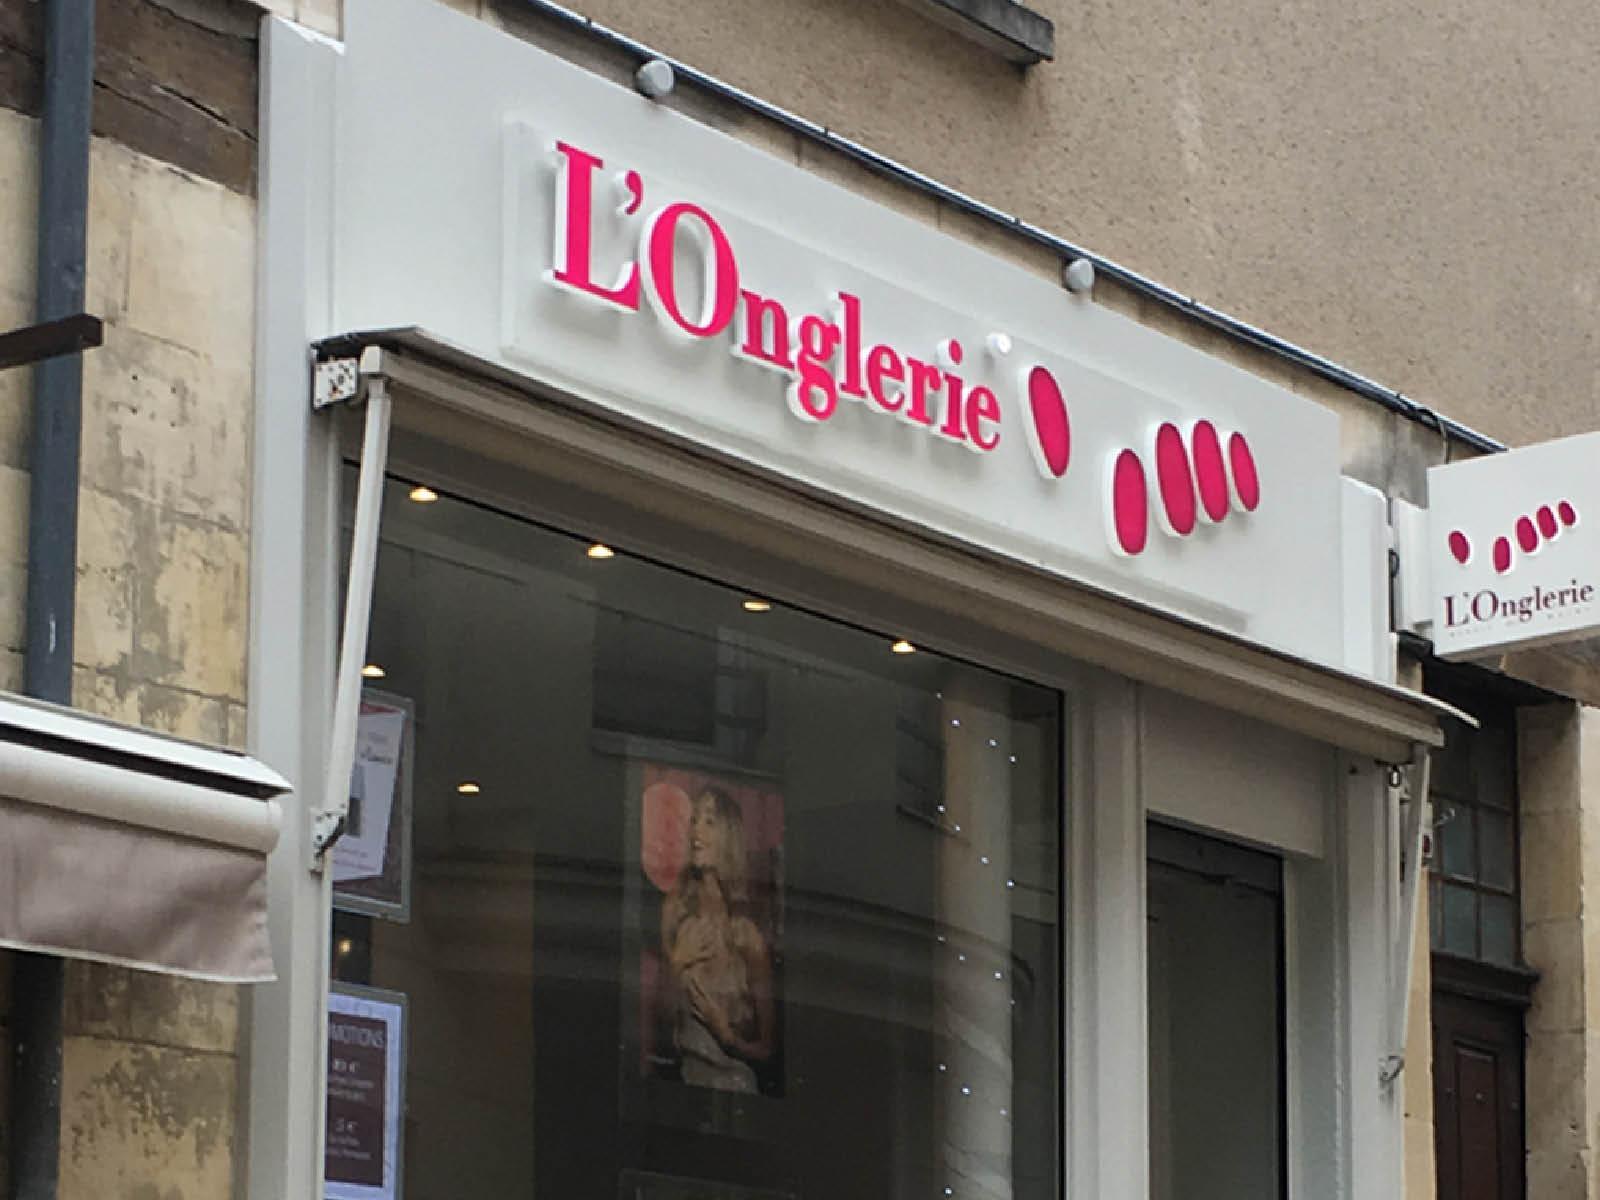 Institut L'Onglerie – Angers